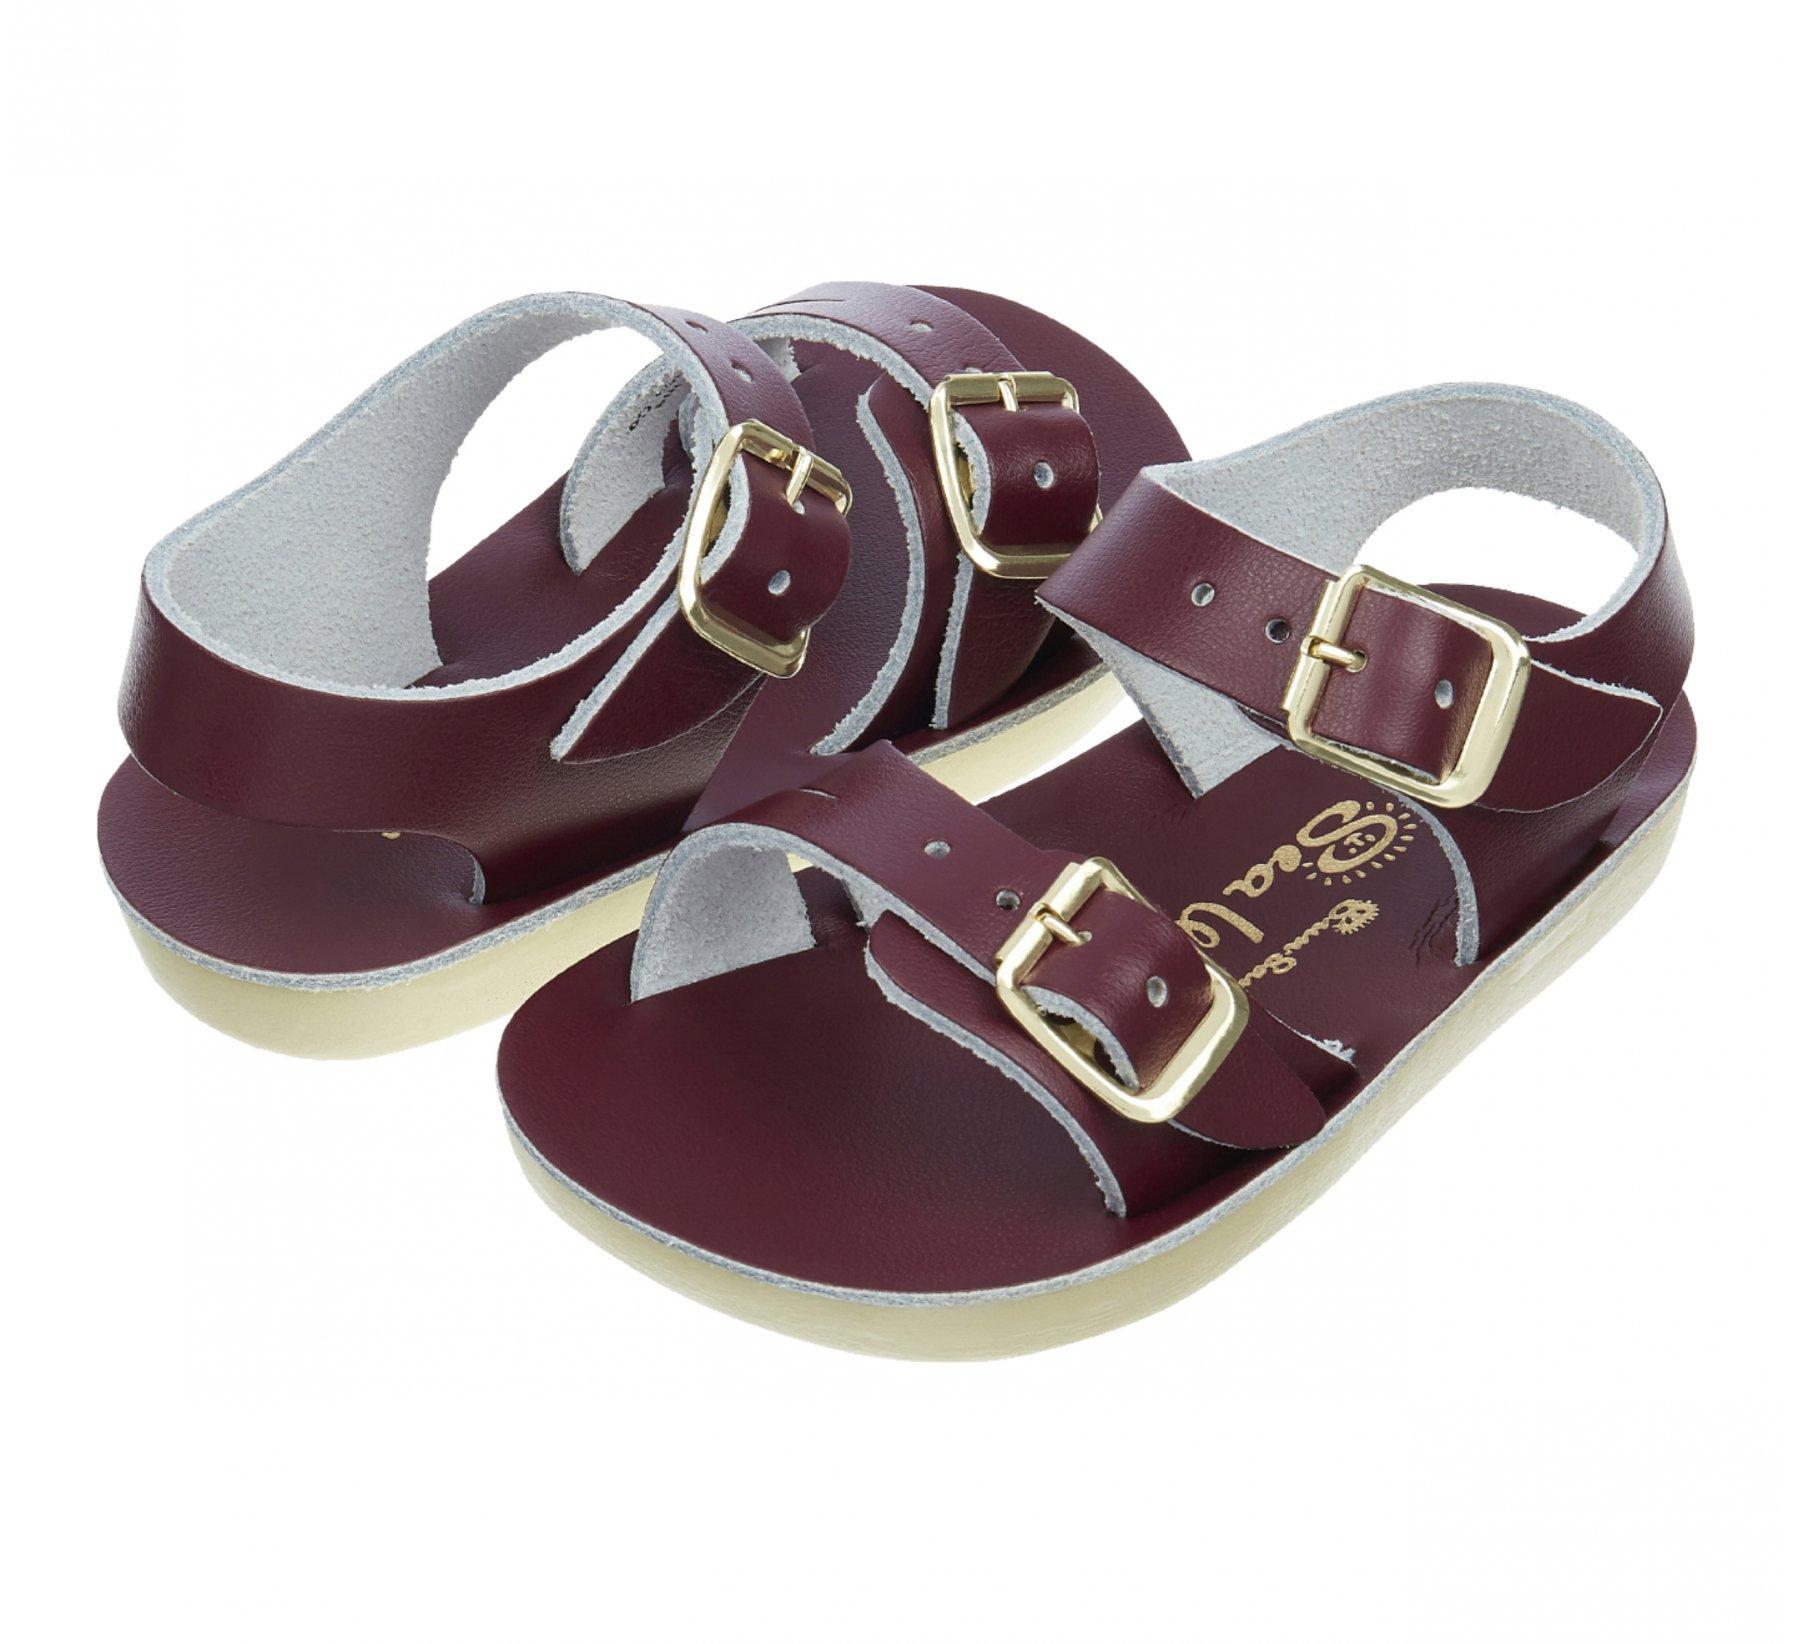 Seawee Claret  - Salt Water Sandals